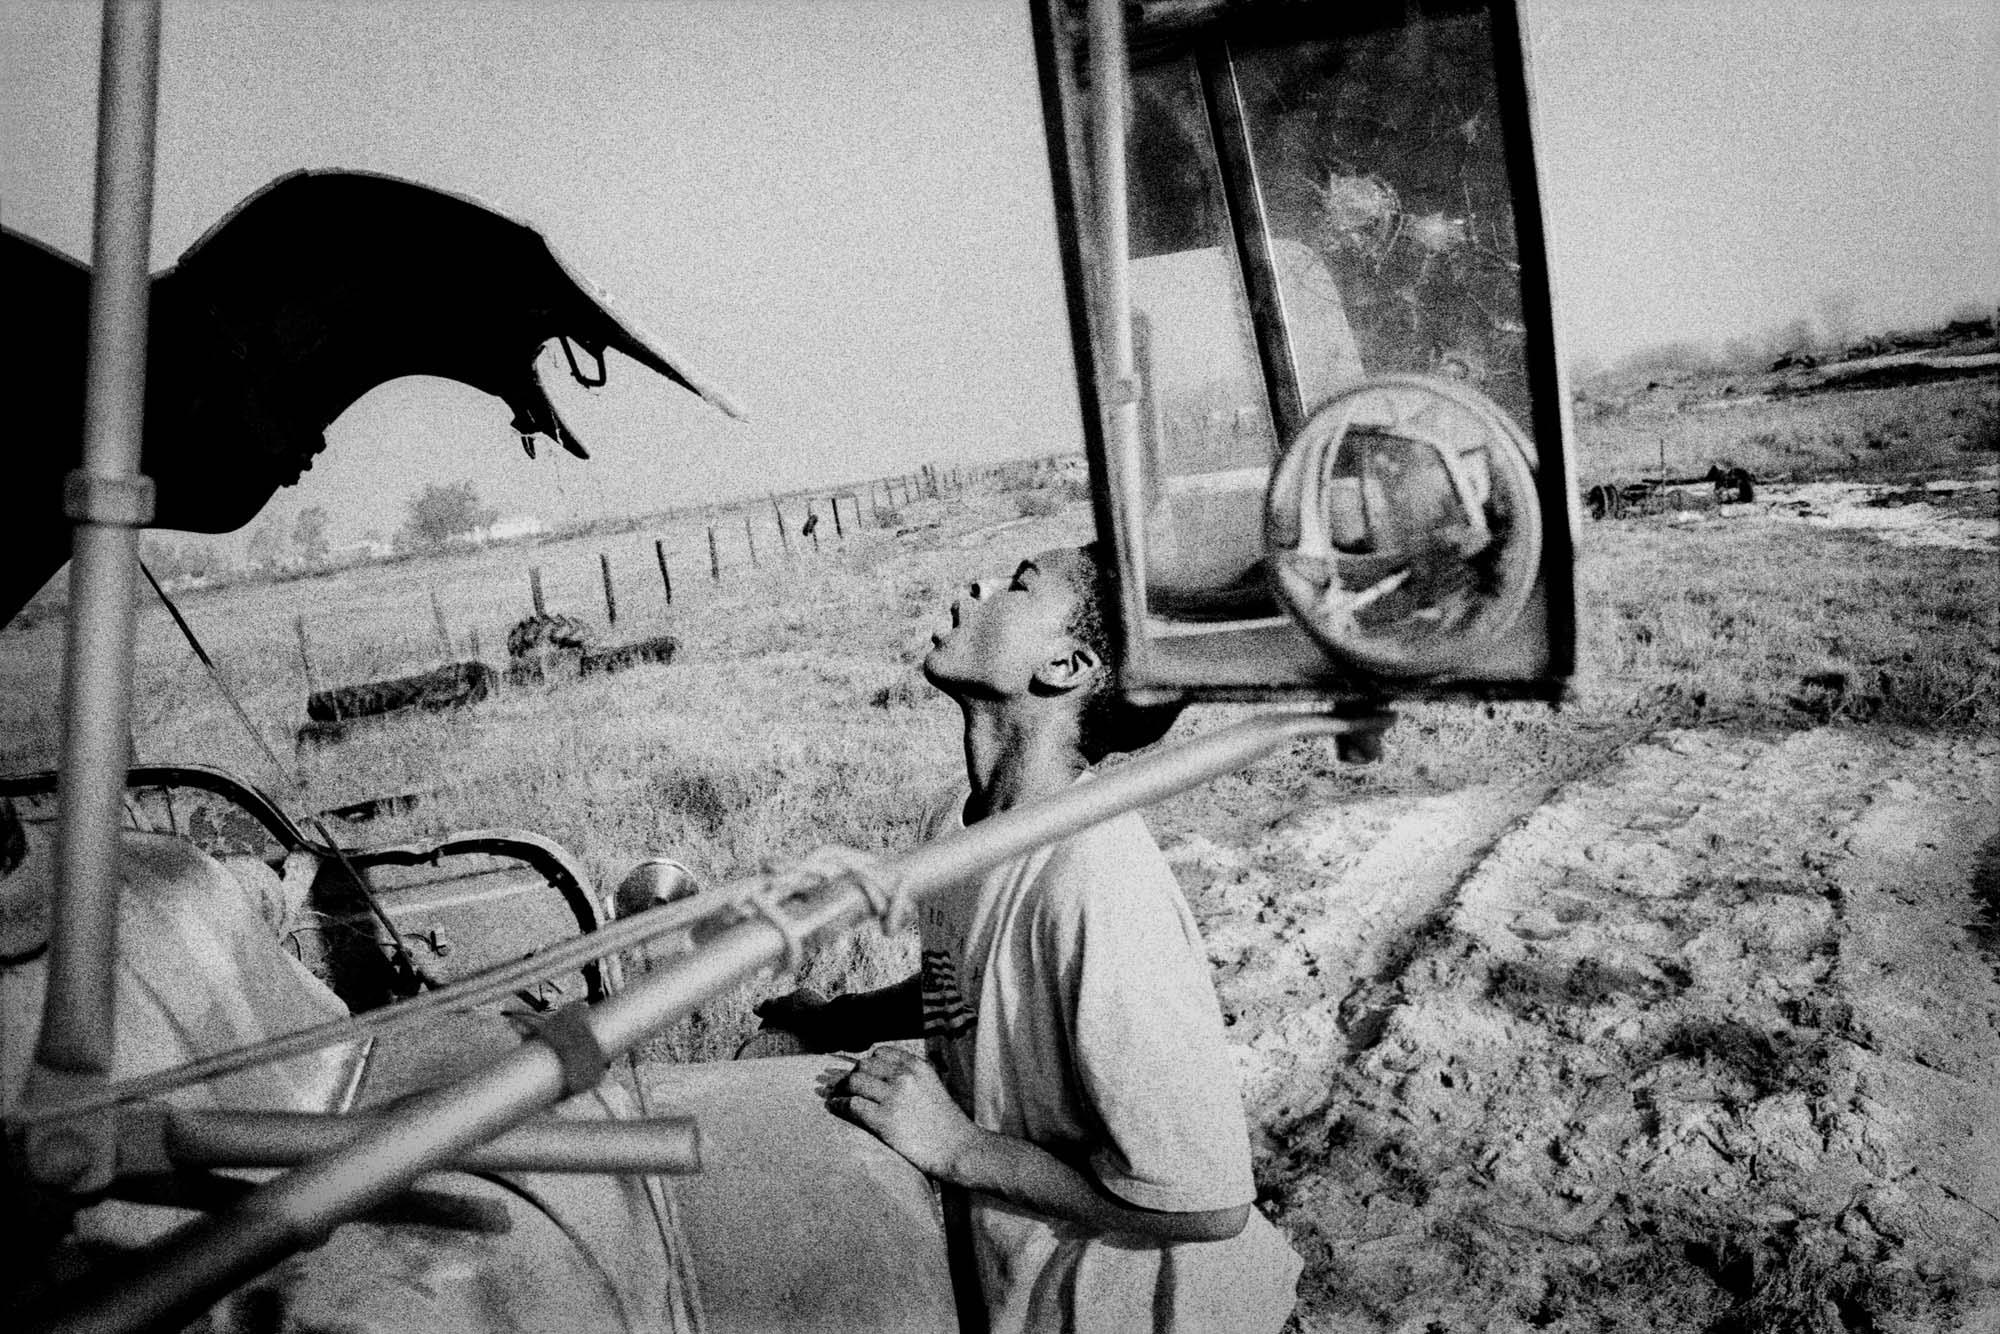 Boy with an old farm truck. Teviston, CA.